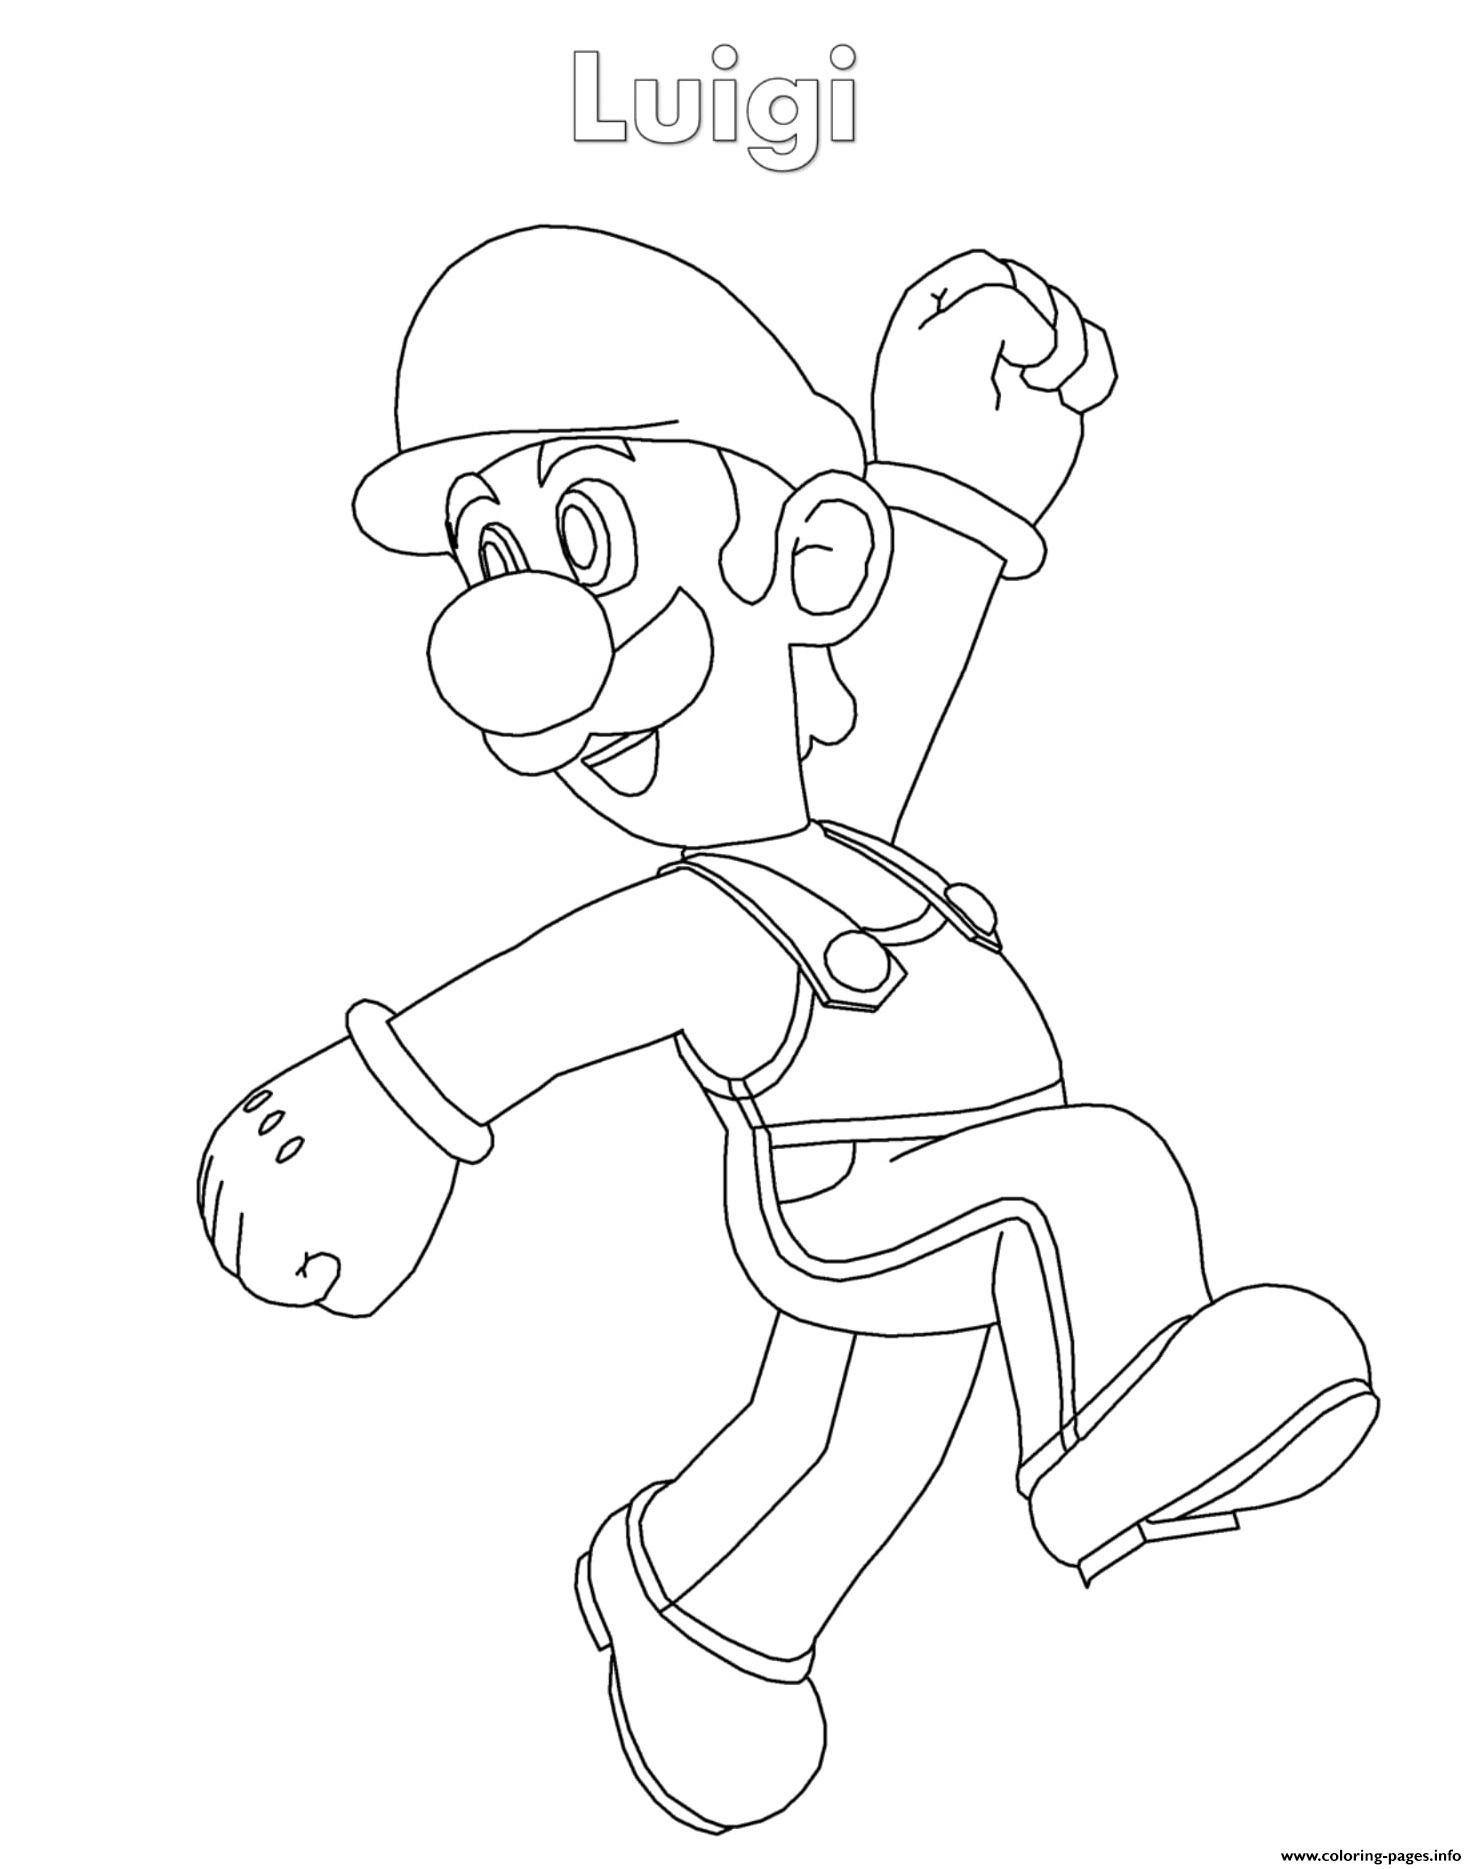 Super Mario Coloring Pages Luigi Super Mario Nintendo Coloring Pages Printable Super Mario Coloring Pages Mario Coloring Pages Puppy Coloring Pages